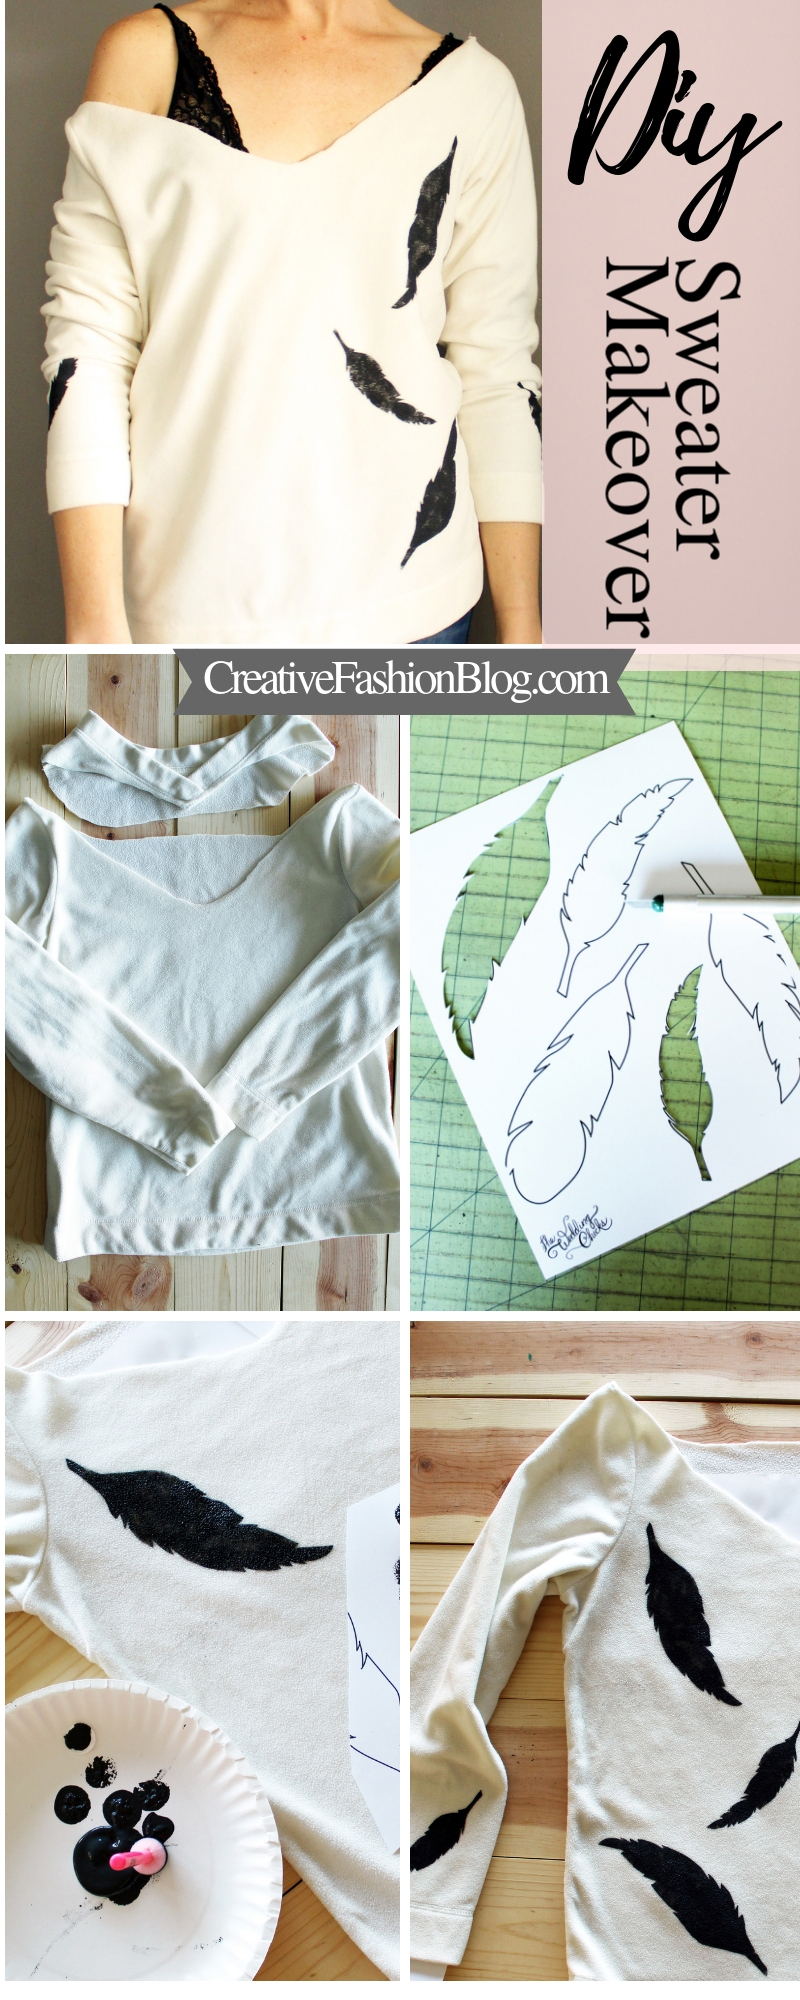 DIY feather stencil sweater refashion makeover..